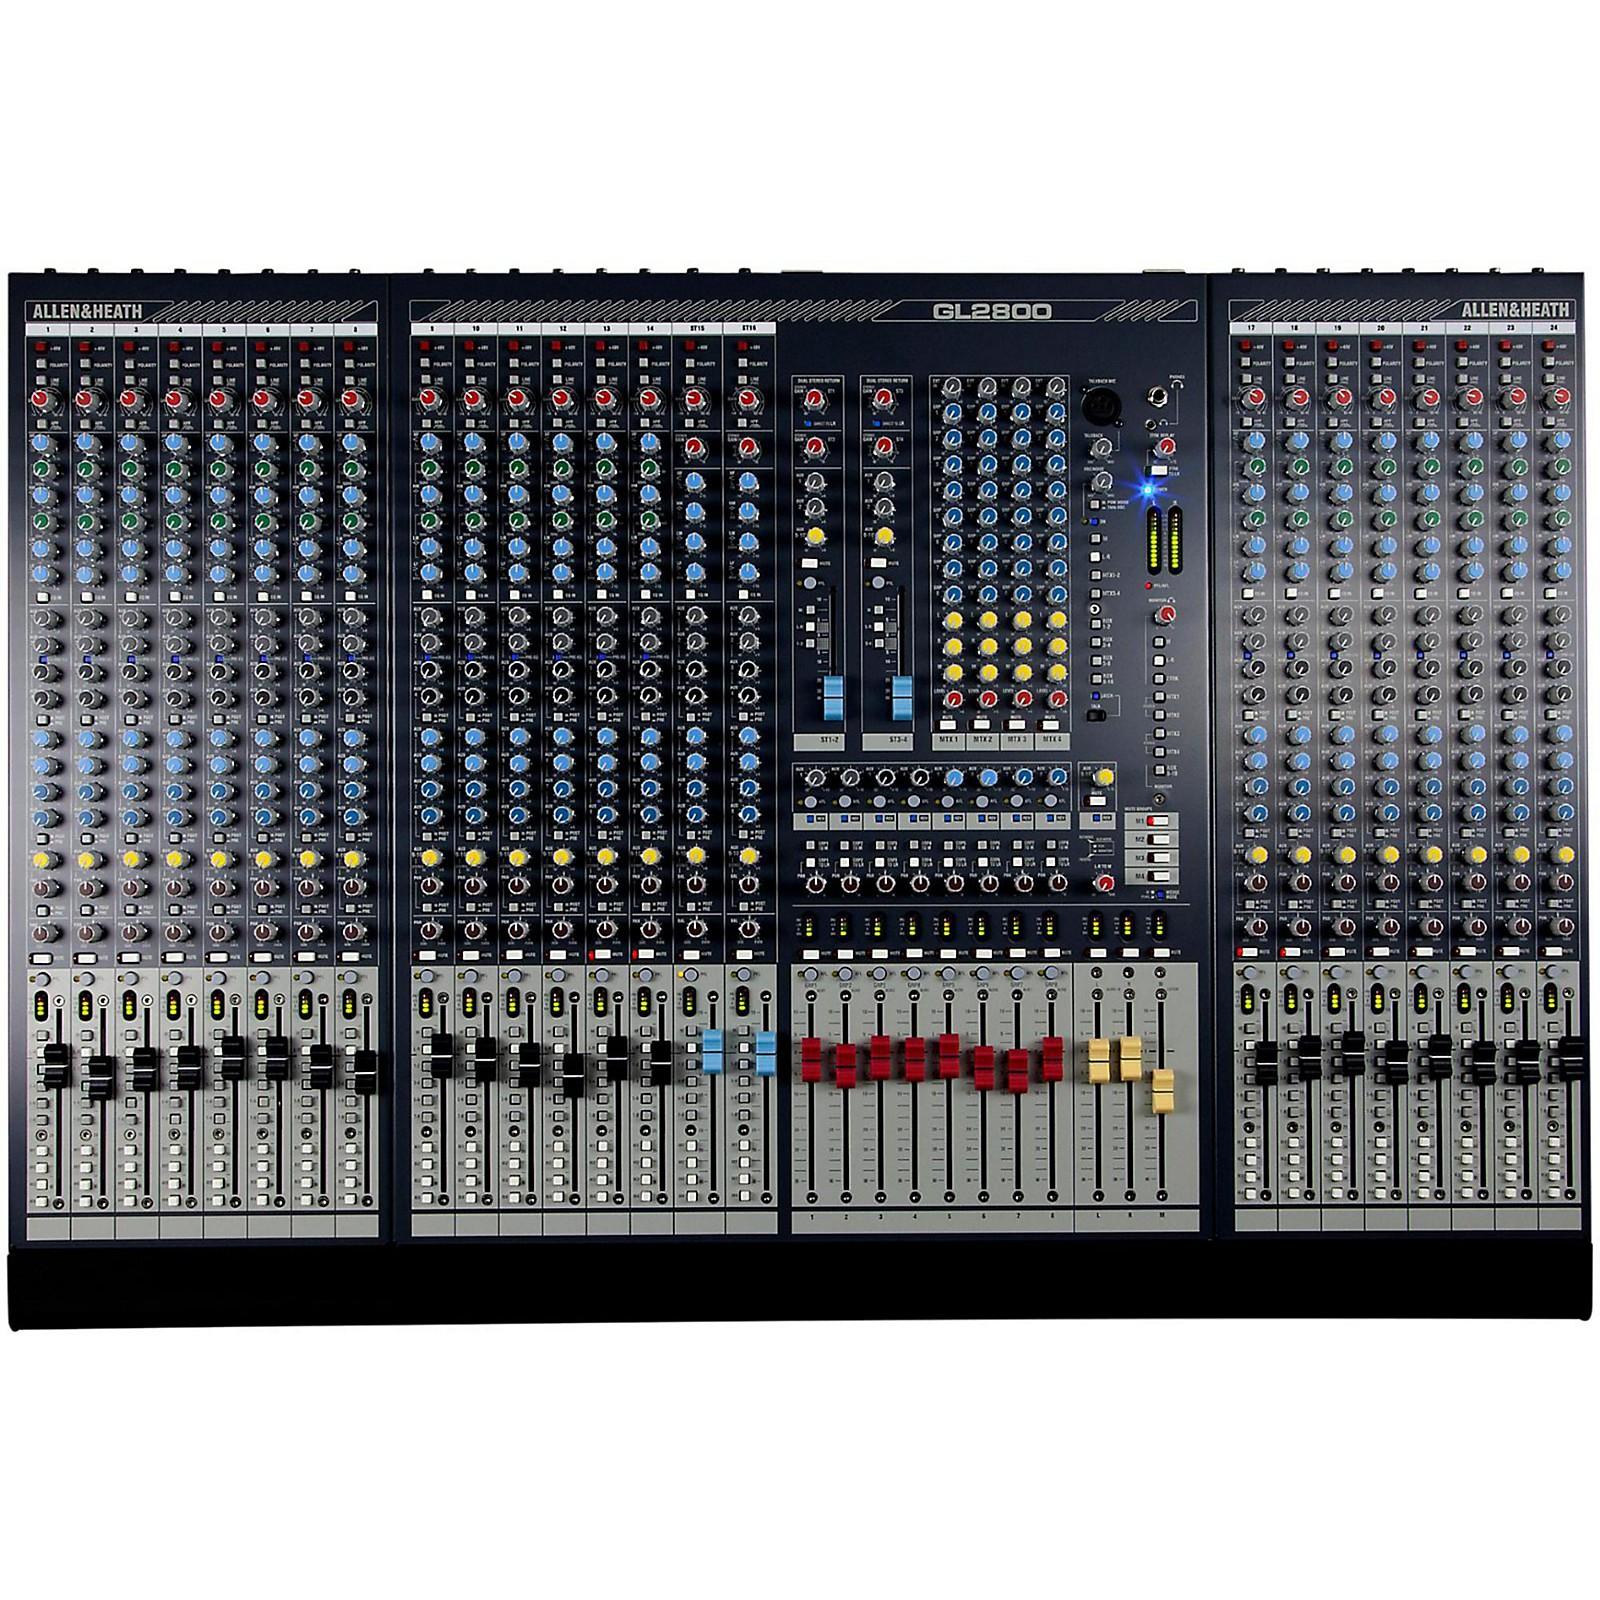 Allen & Heath GL2800-32 Mixer